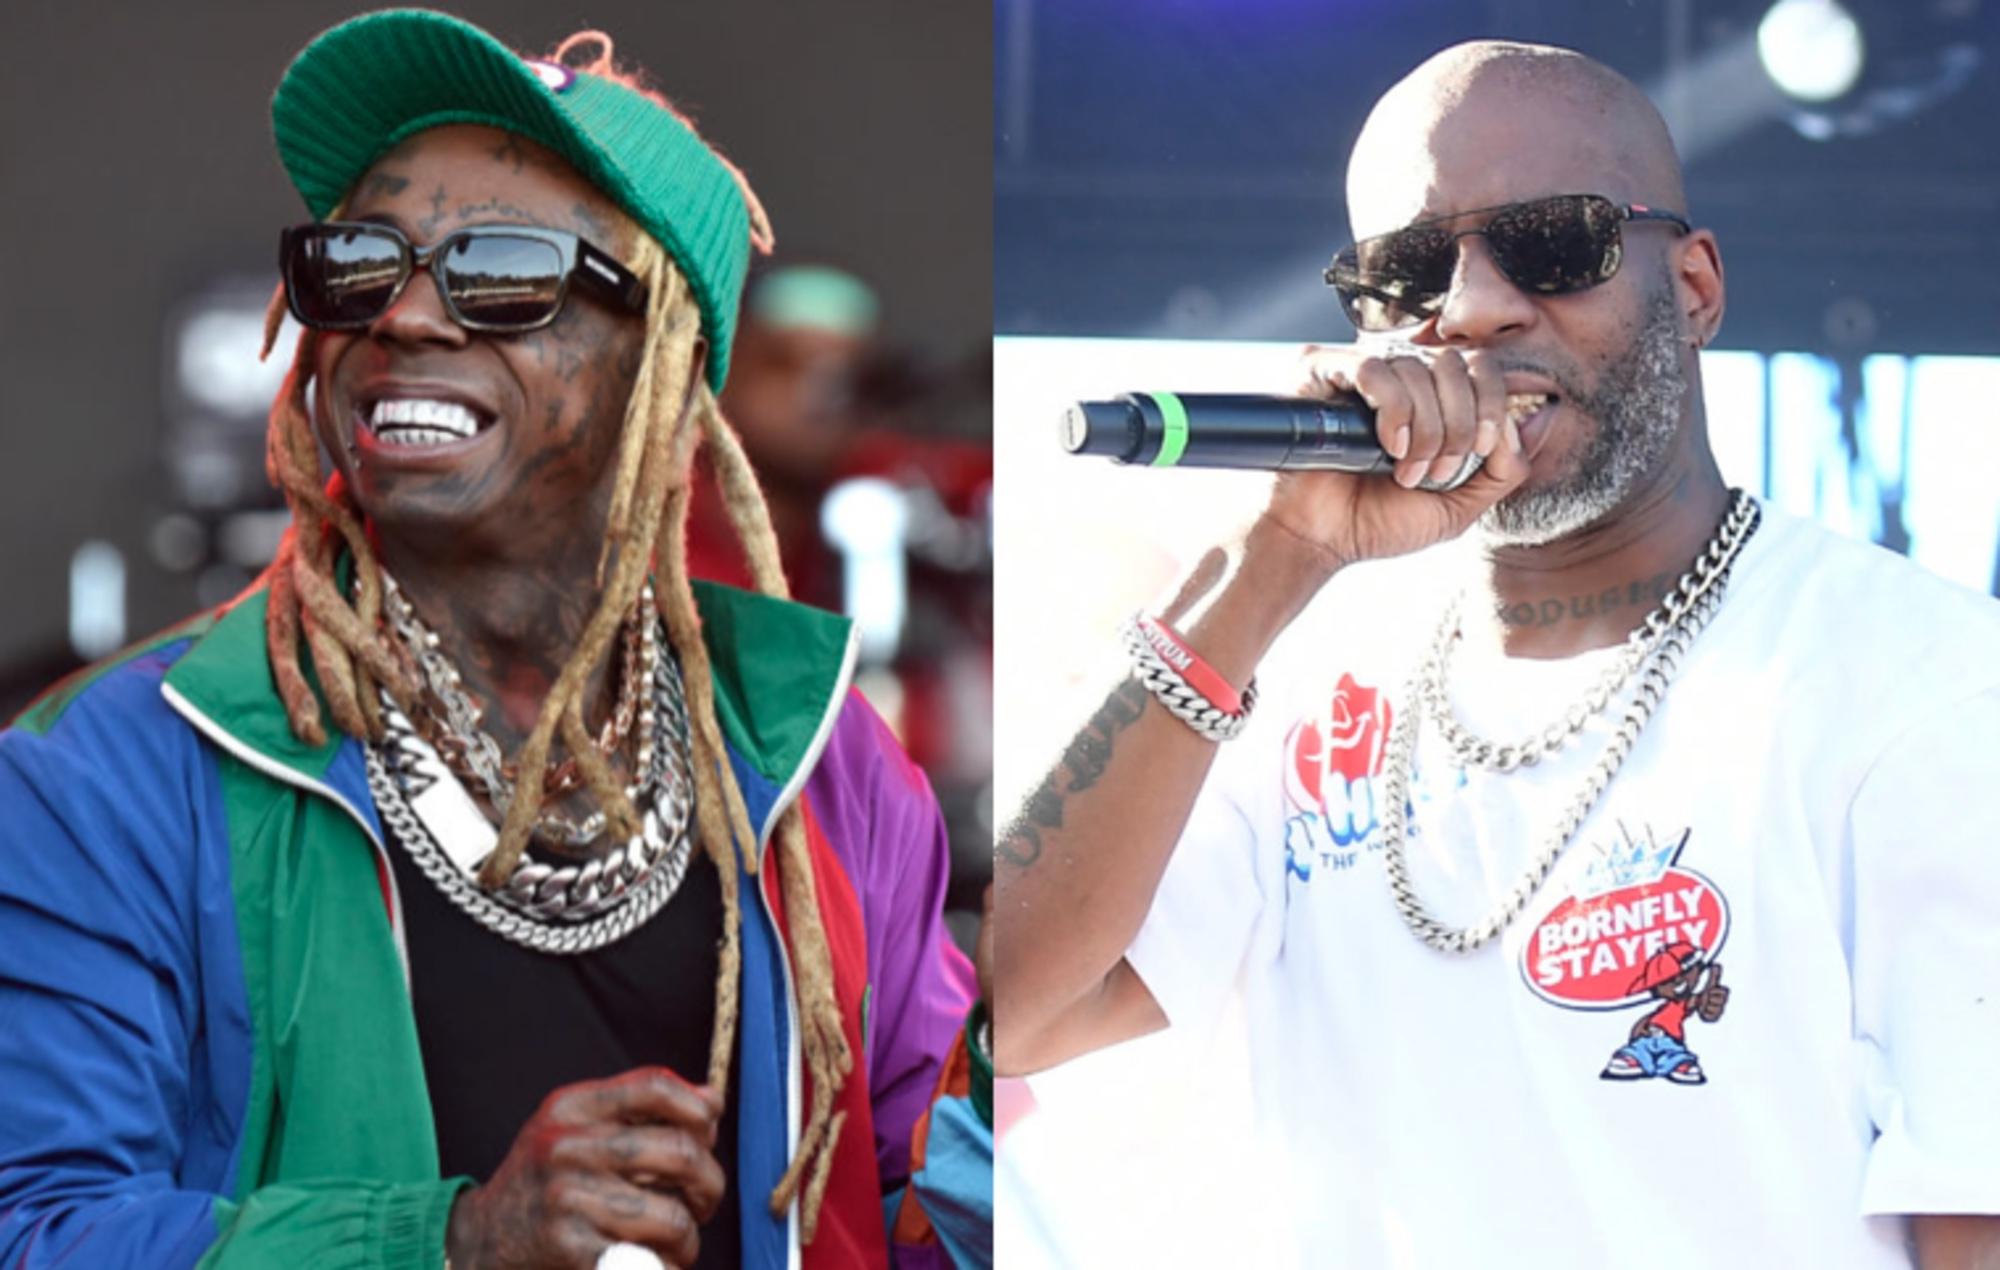 Lil Wayne Pays Tribute To DMX At Trillerfest In Miami